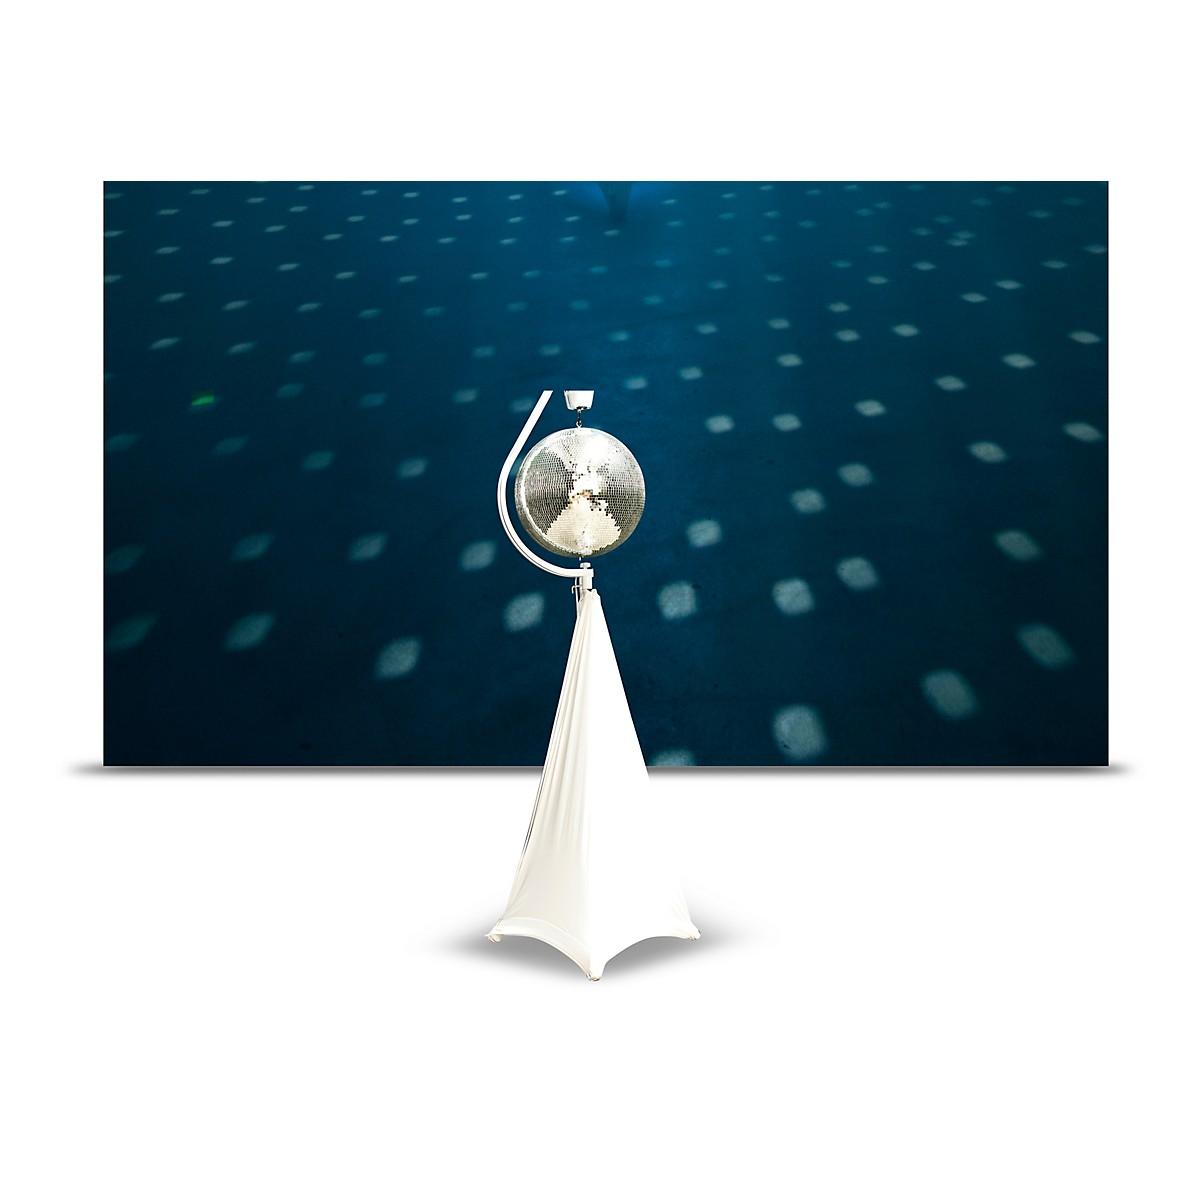 Eliminator Lighting Decor MBSK Mirror Ball Stand With Motor